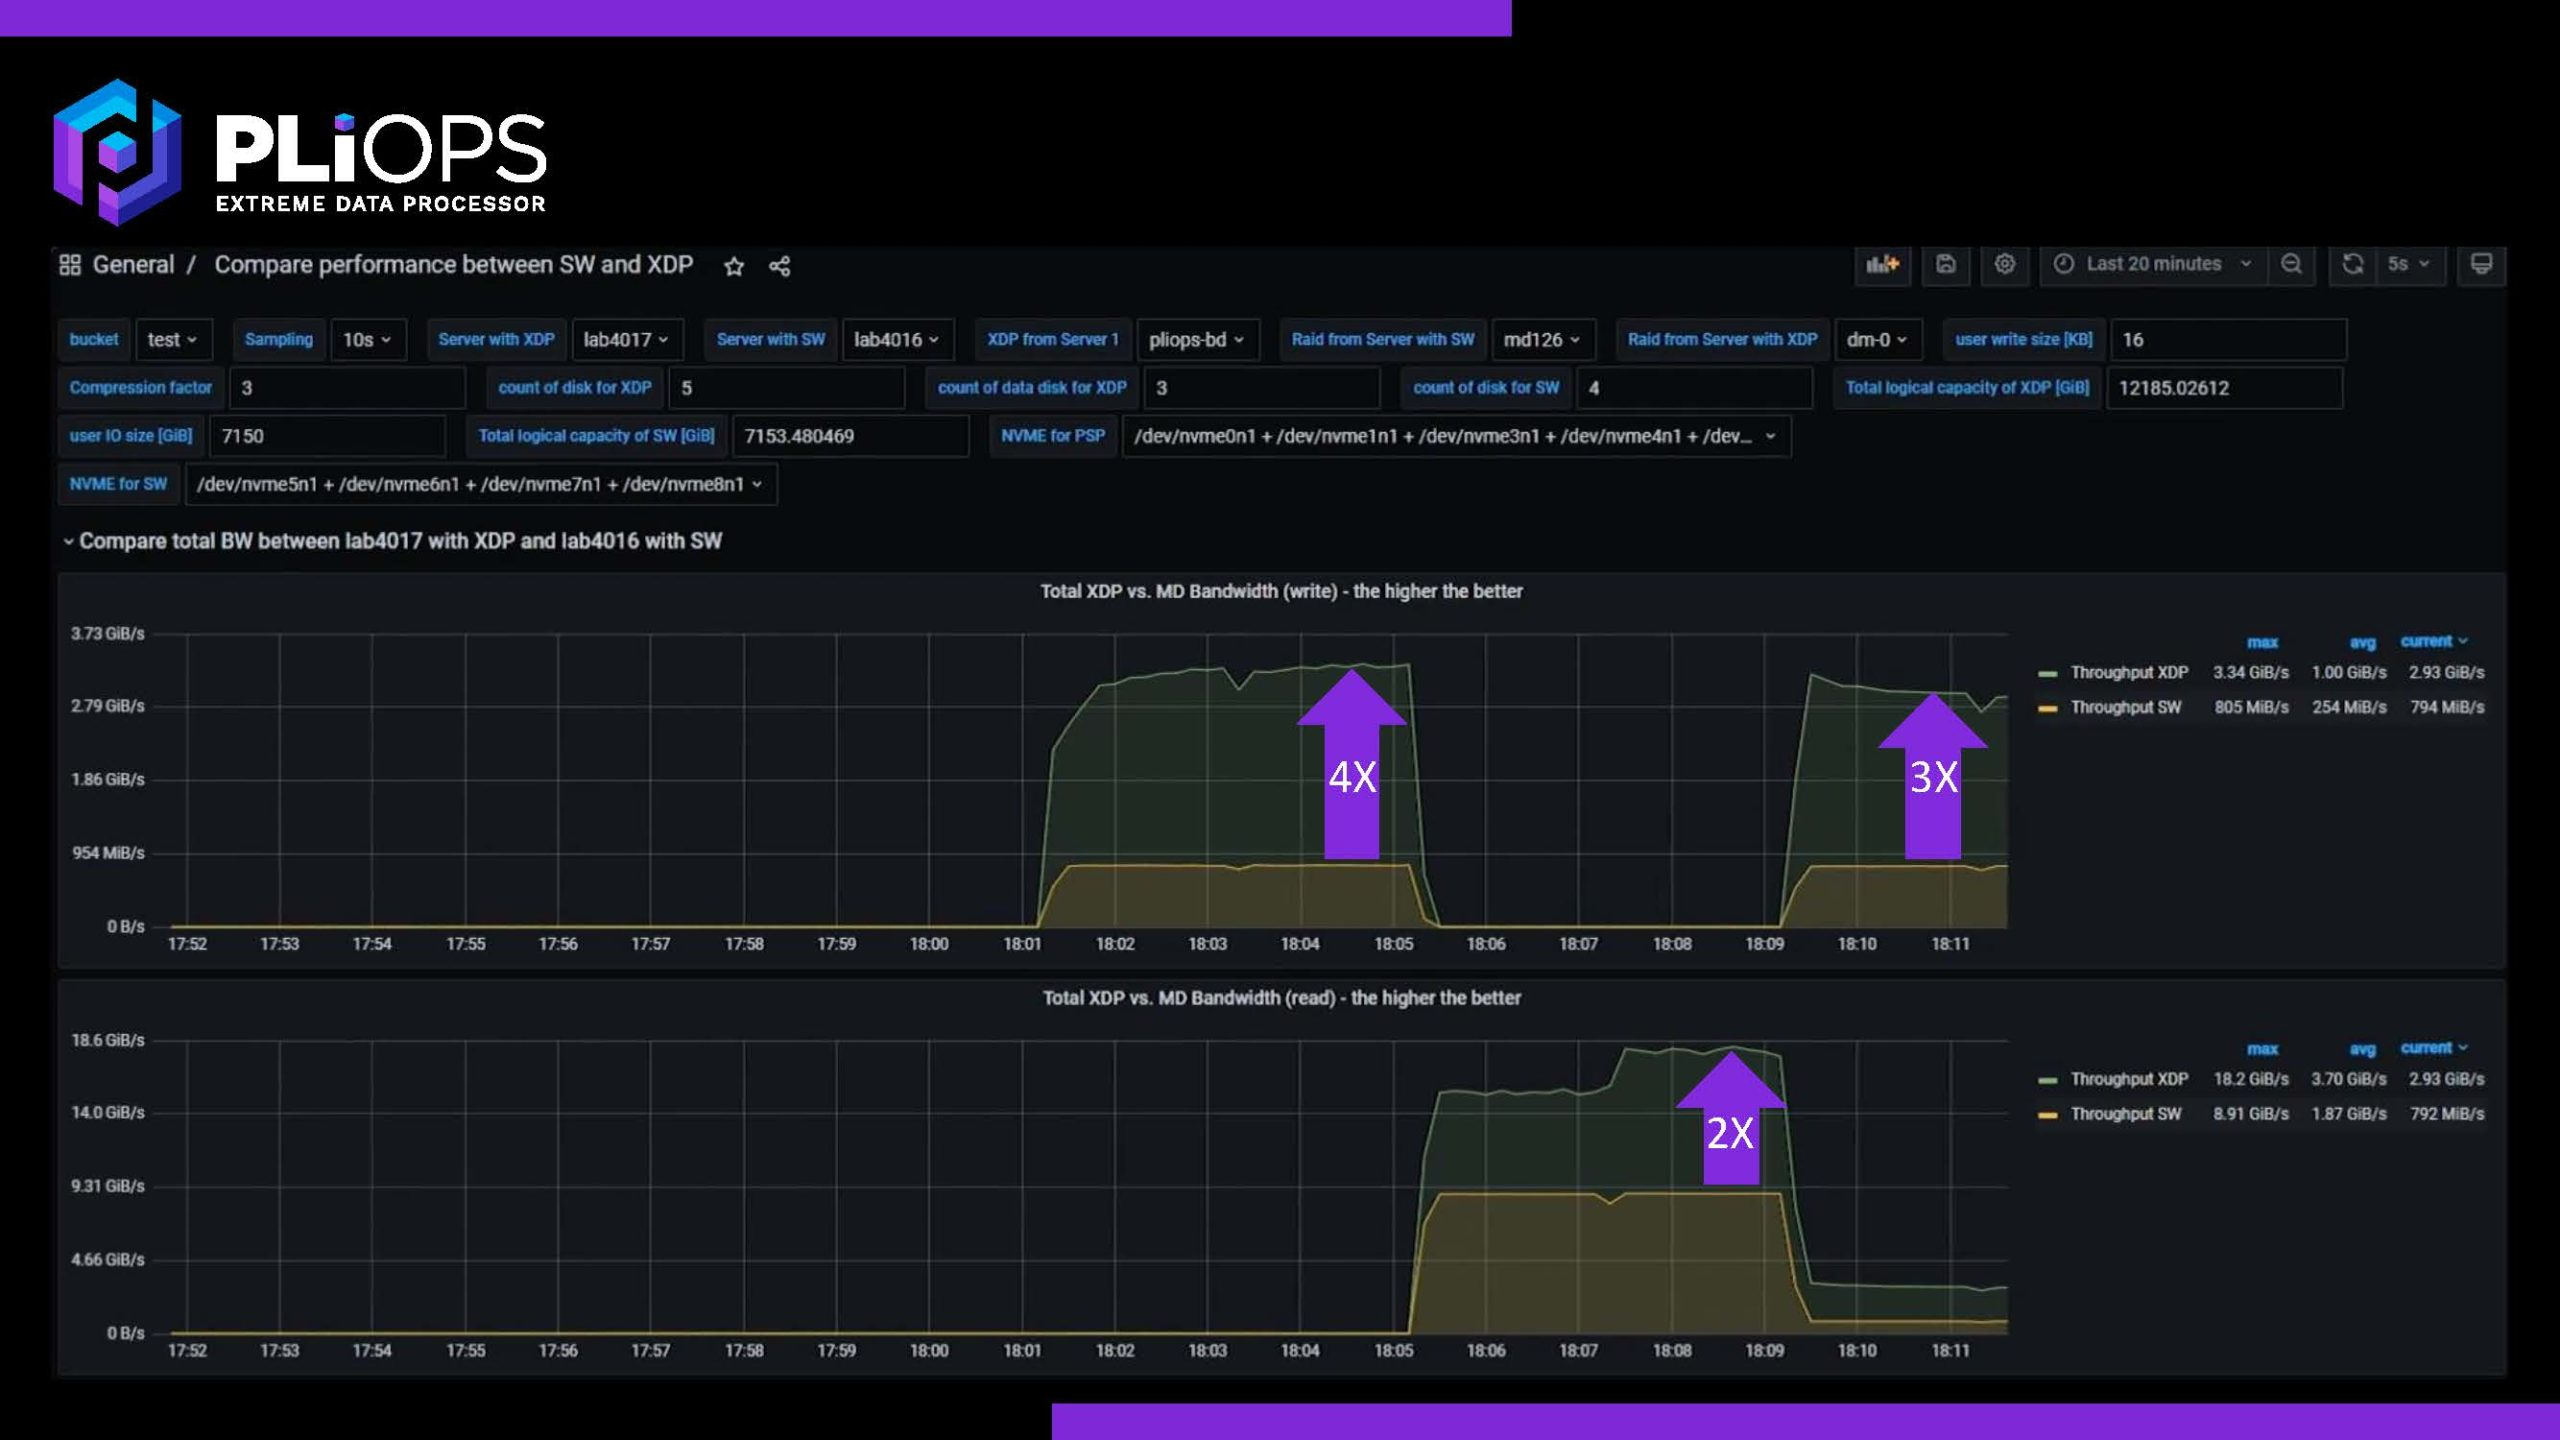 Pliops XDP V Software Bandwidth